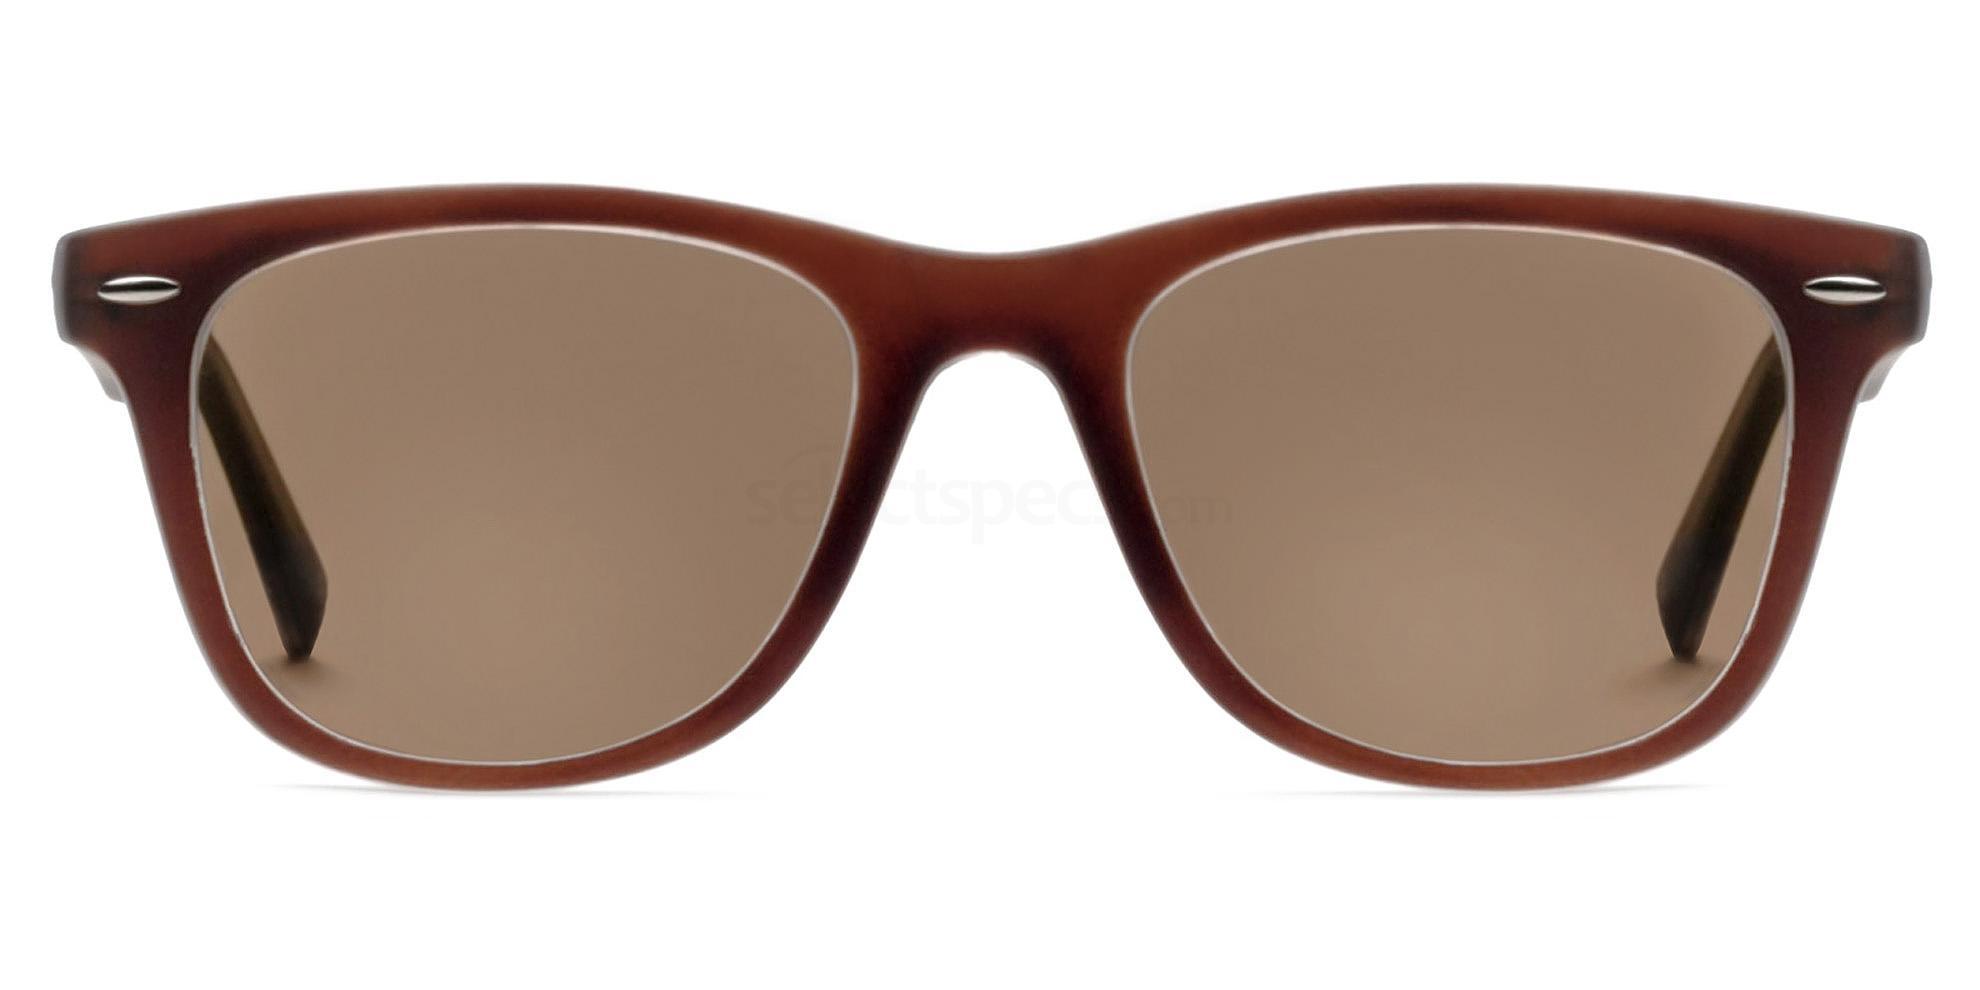 C8 8121 - Brown (Sunglasses) Sunglasses, Savannah